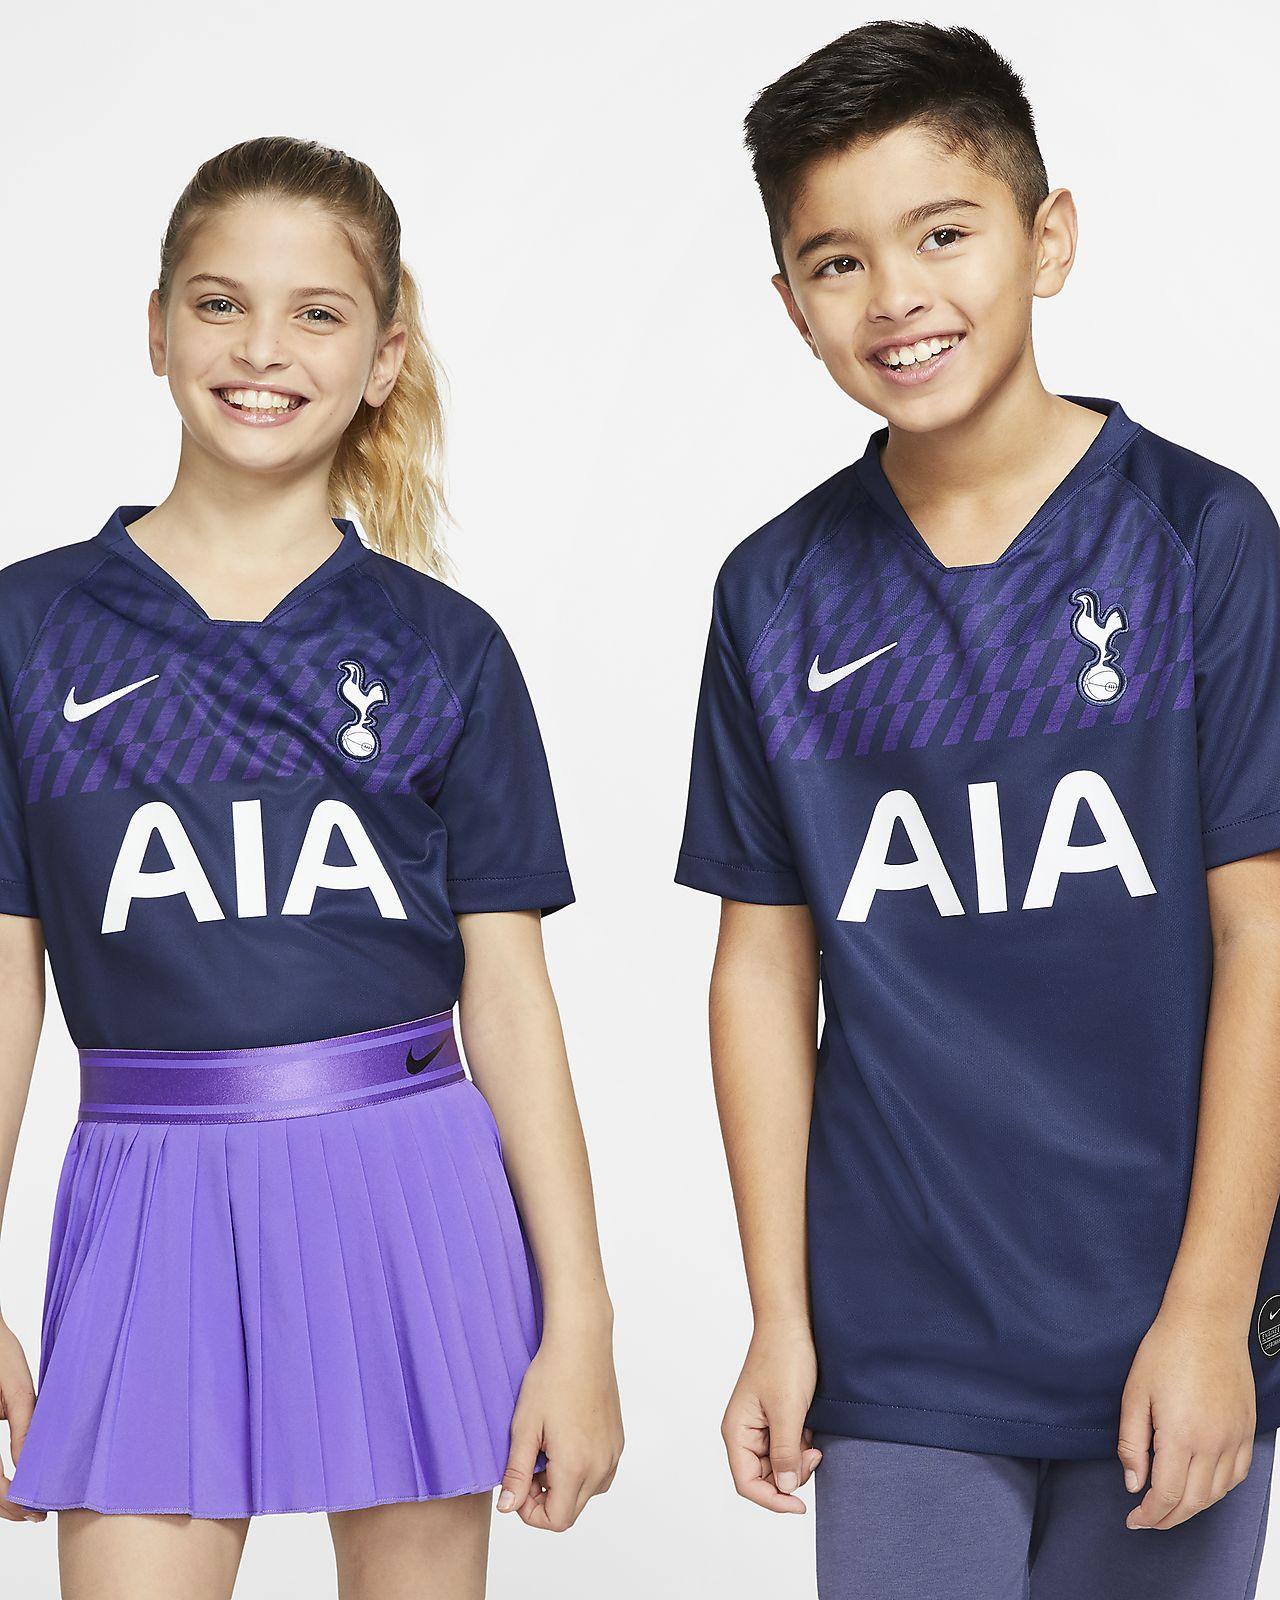 Camiseta de fútbol de visitante para niños talla grande Stadium del Tottenham Hotspur 2019/20